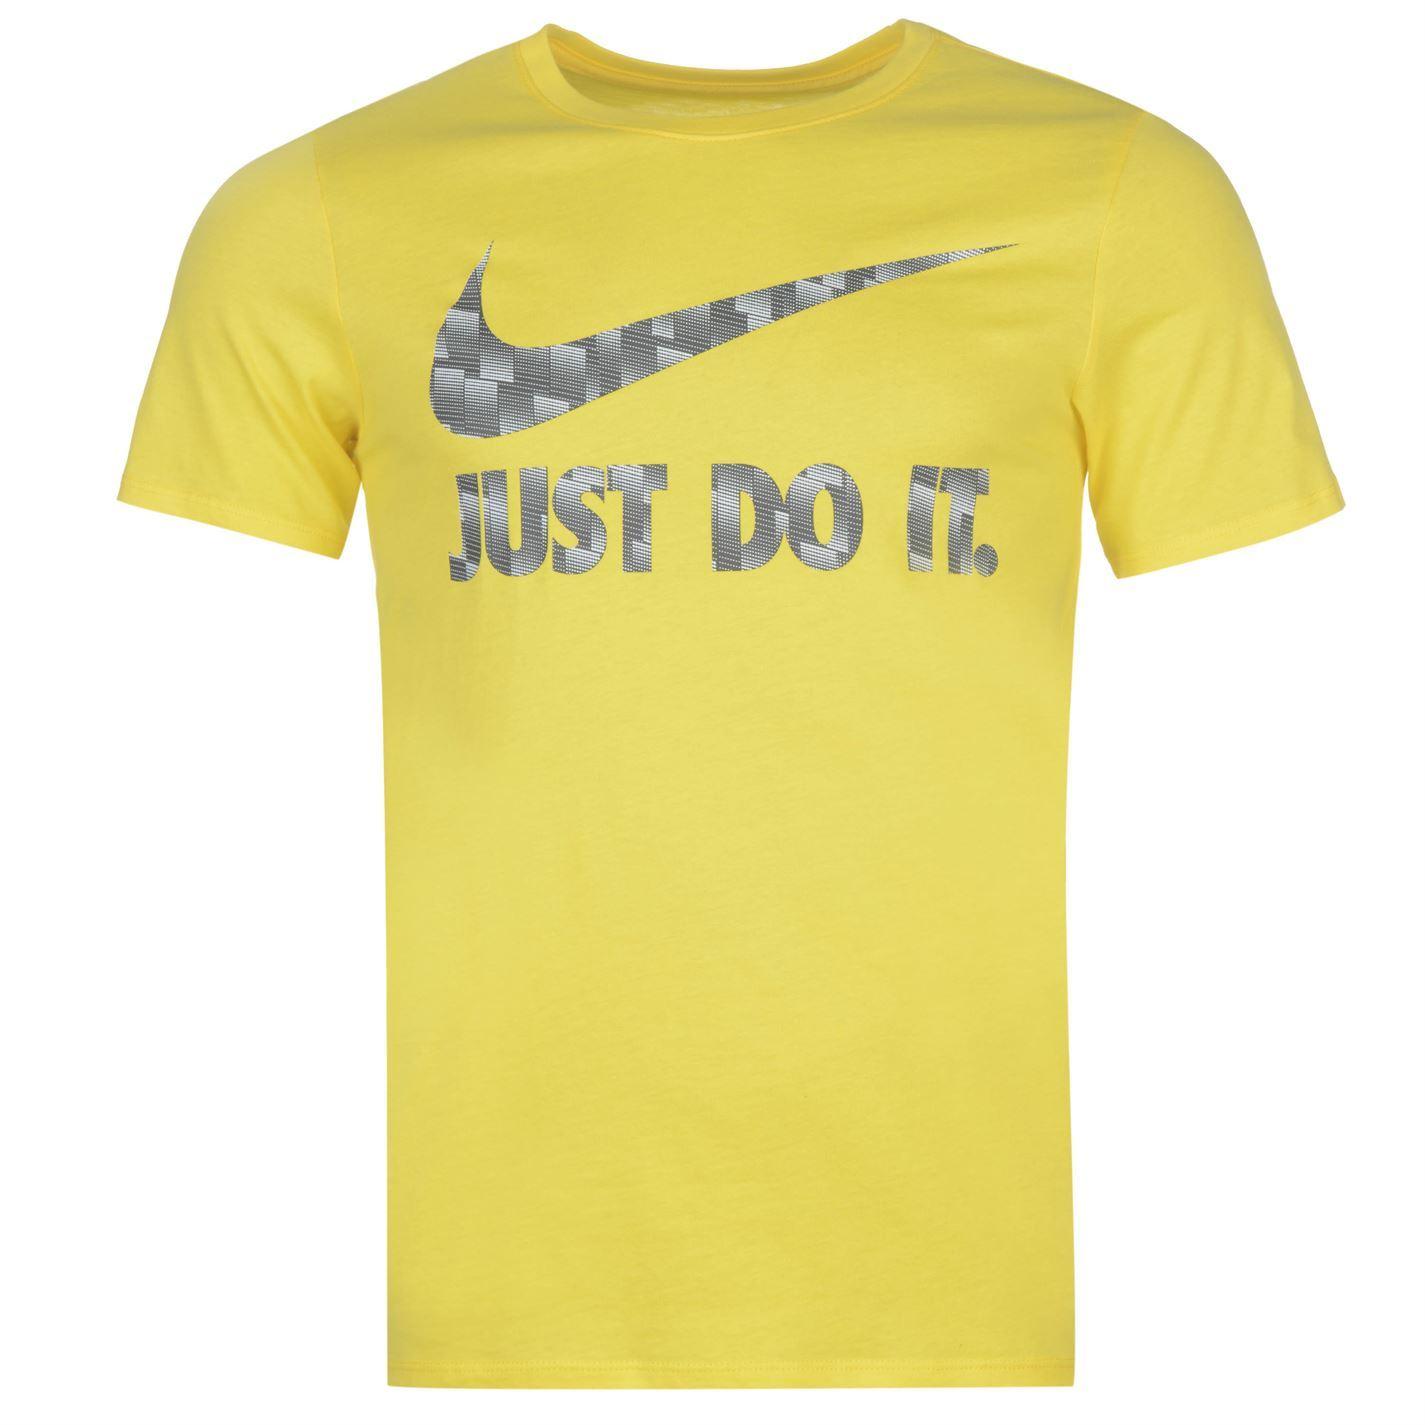 89a8681dea2c Nike Just Do It Swoosh QTT T-Shirt Mens Tee Shirt Top